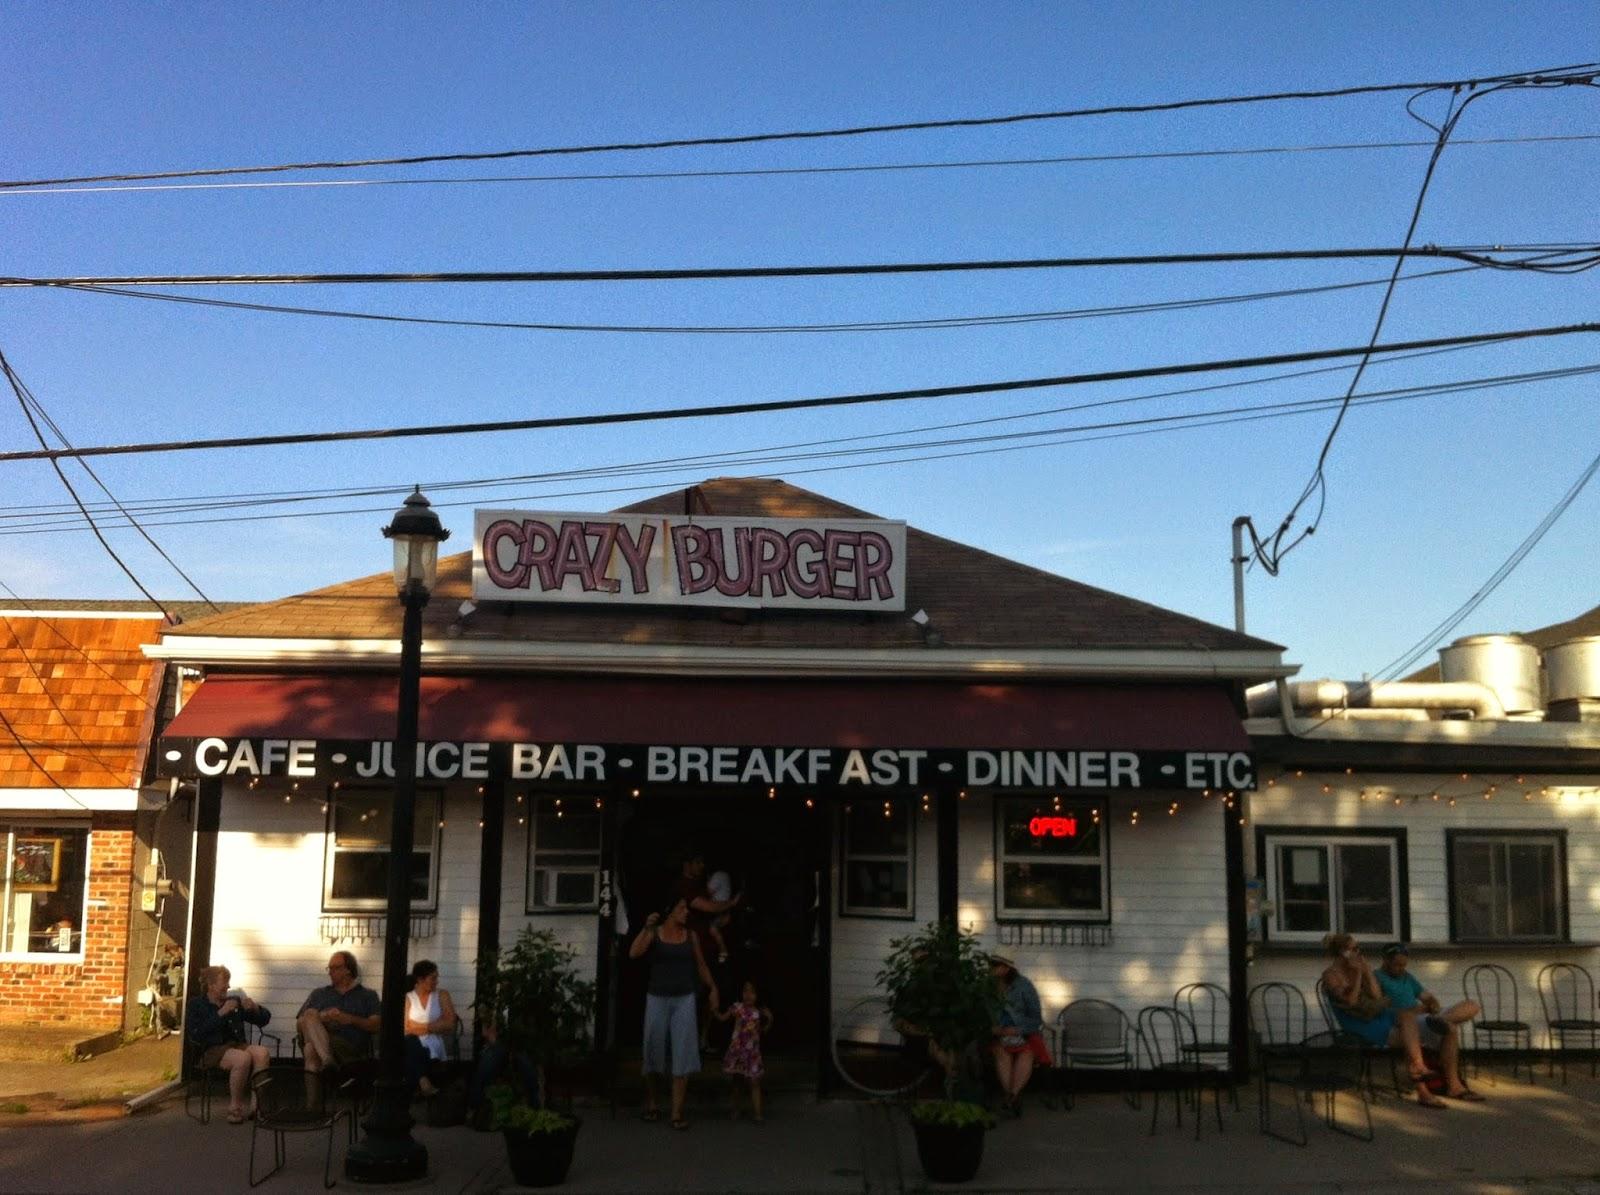 crazy burger in narragansett, rhode island